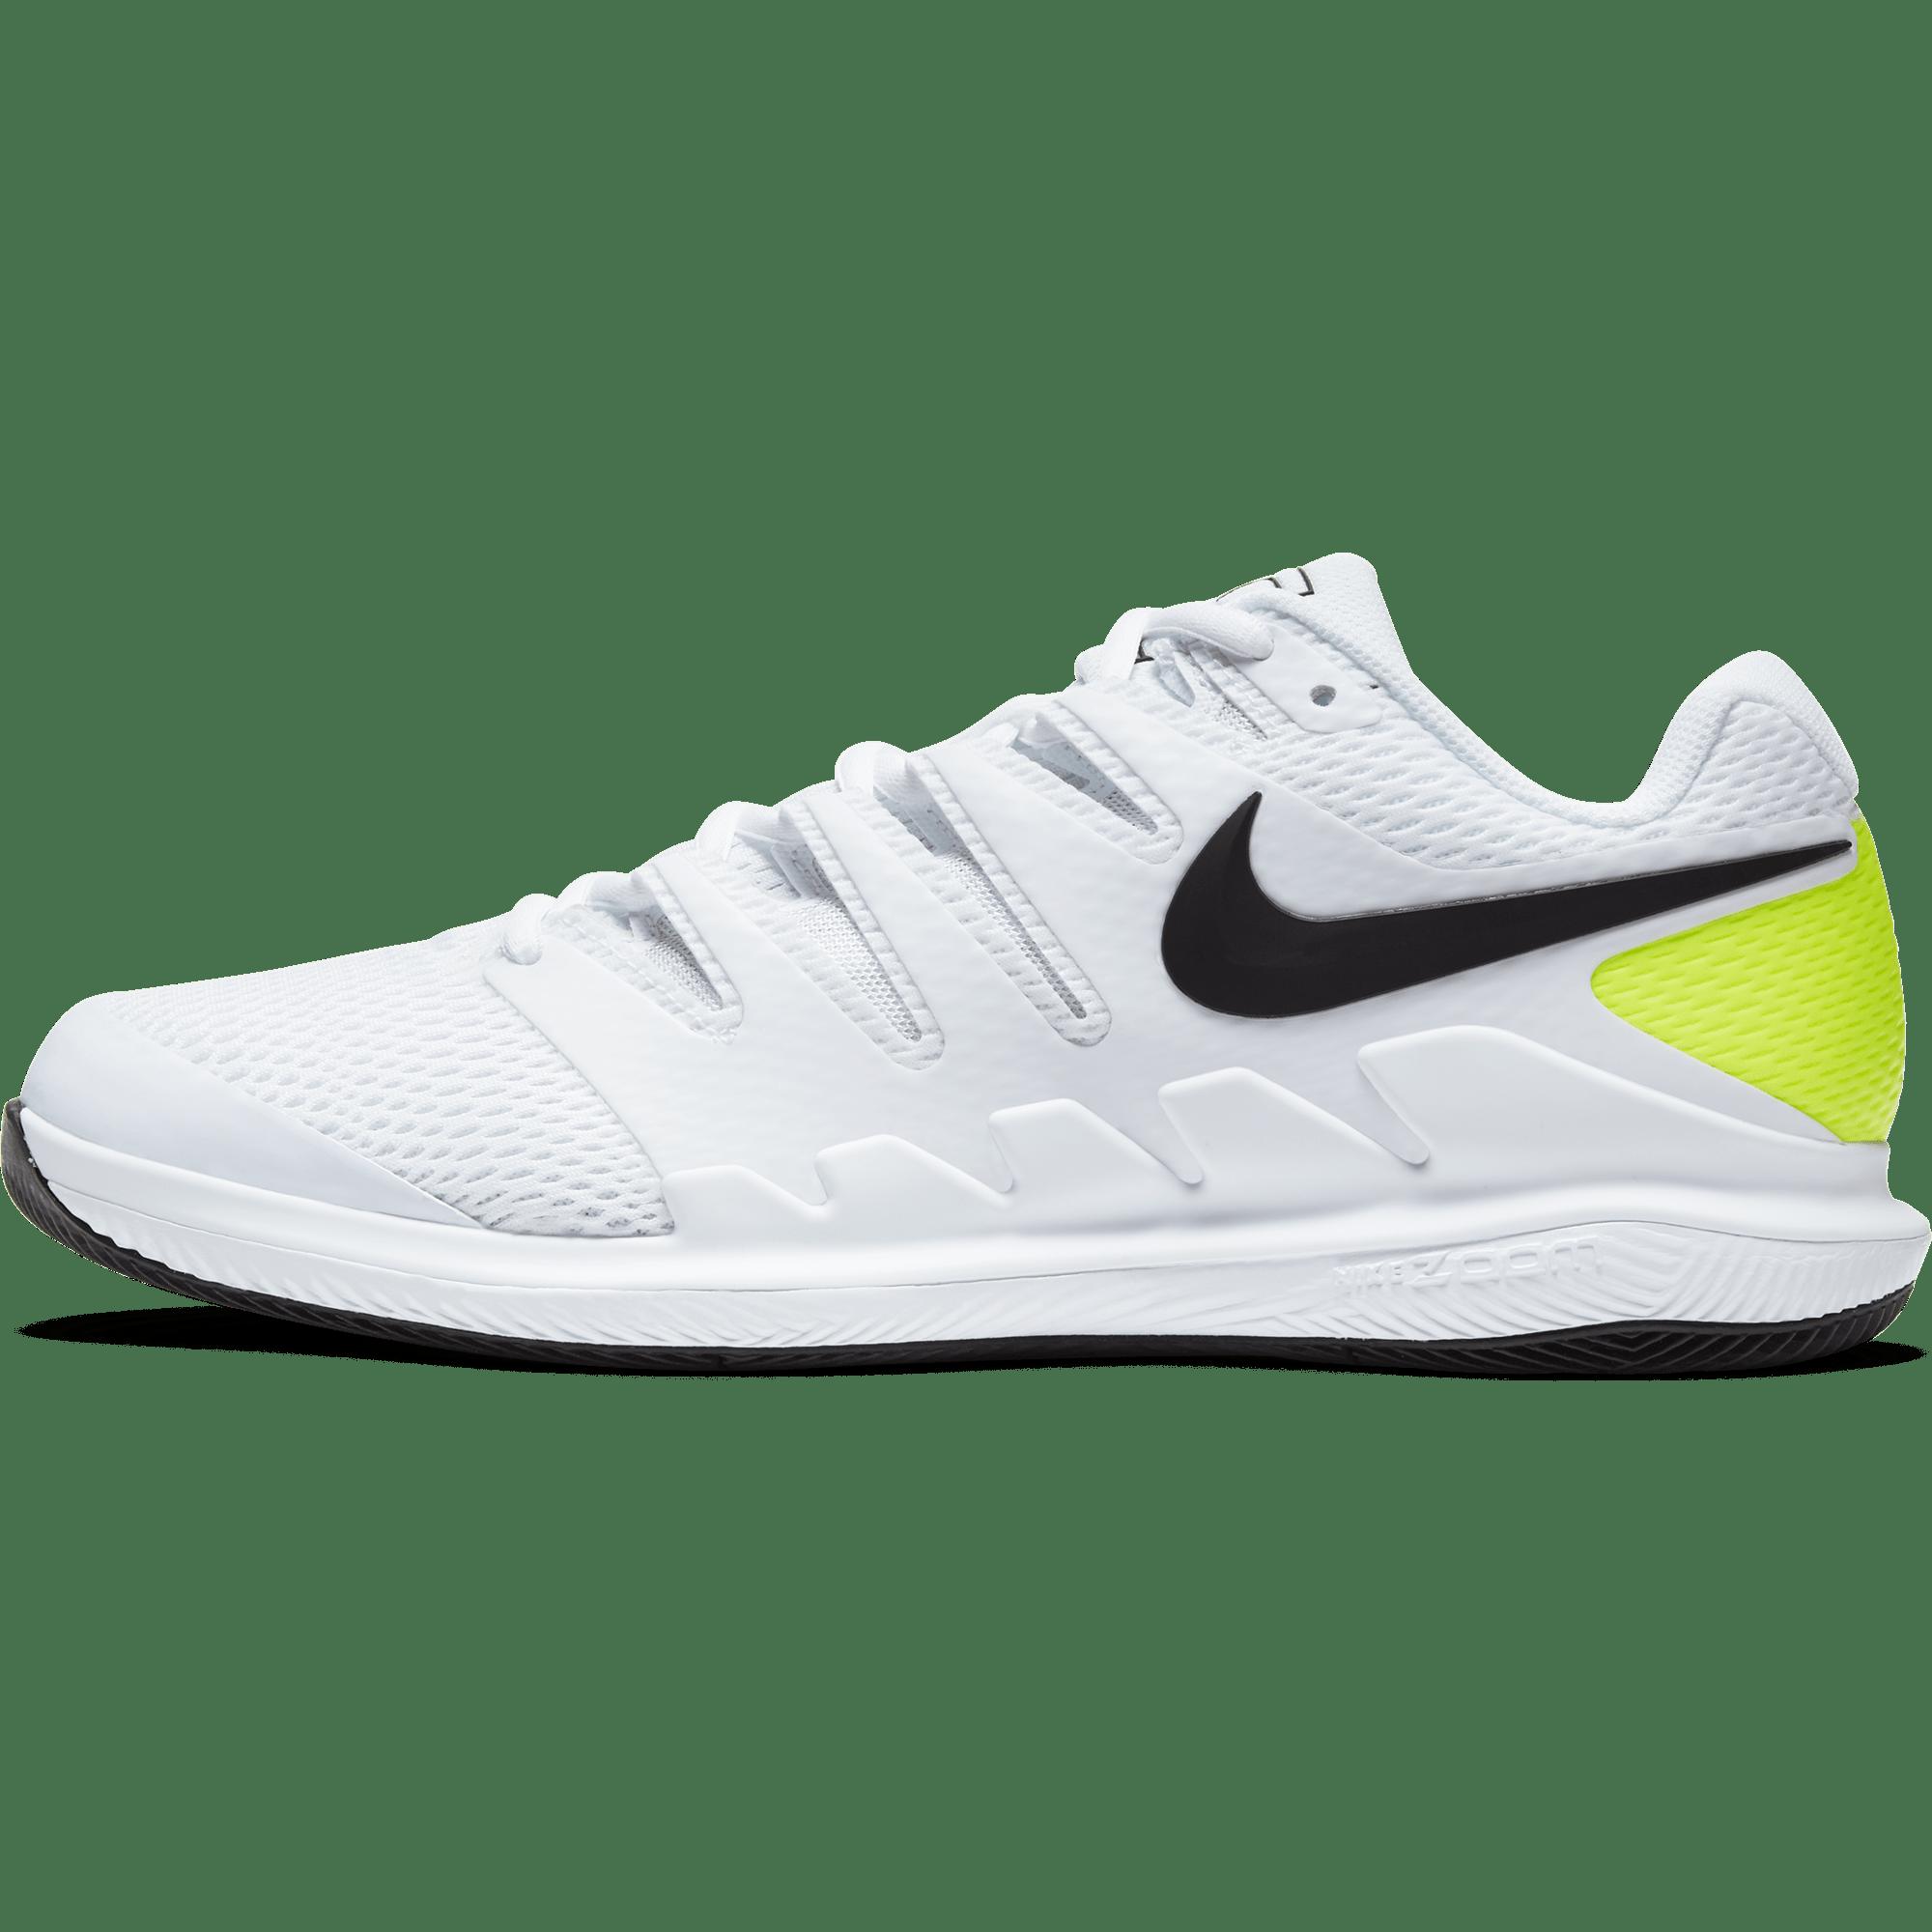 Clearance Tennis Shoes   PGA TOUR